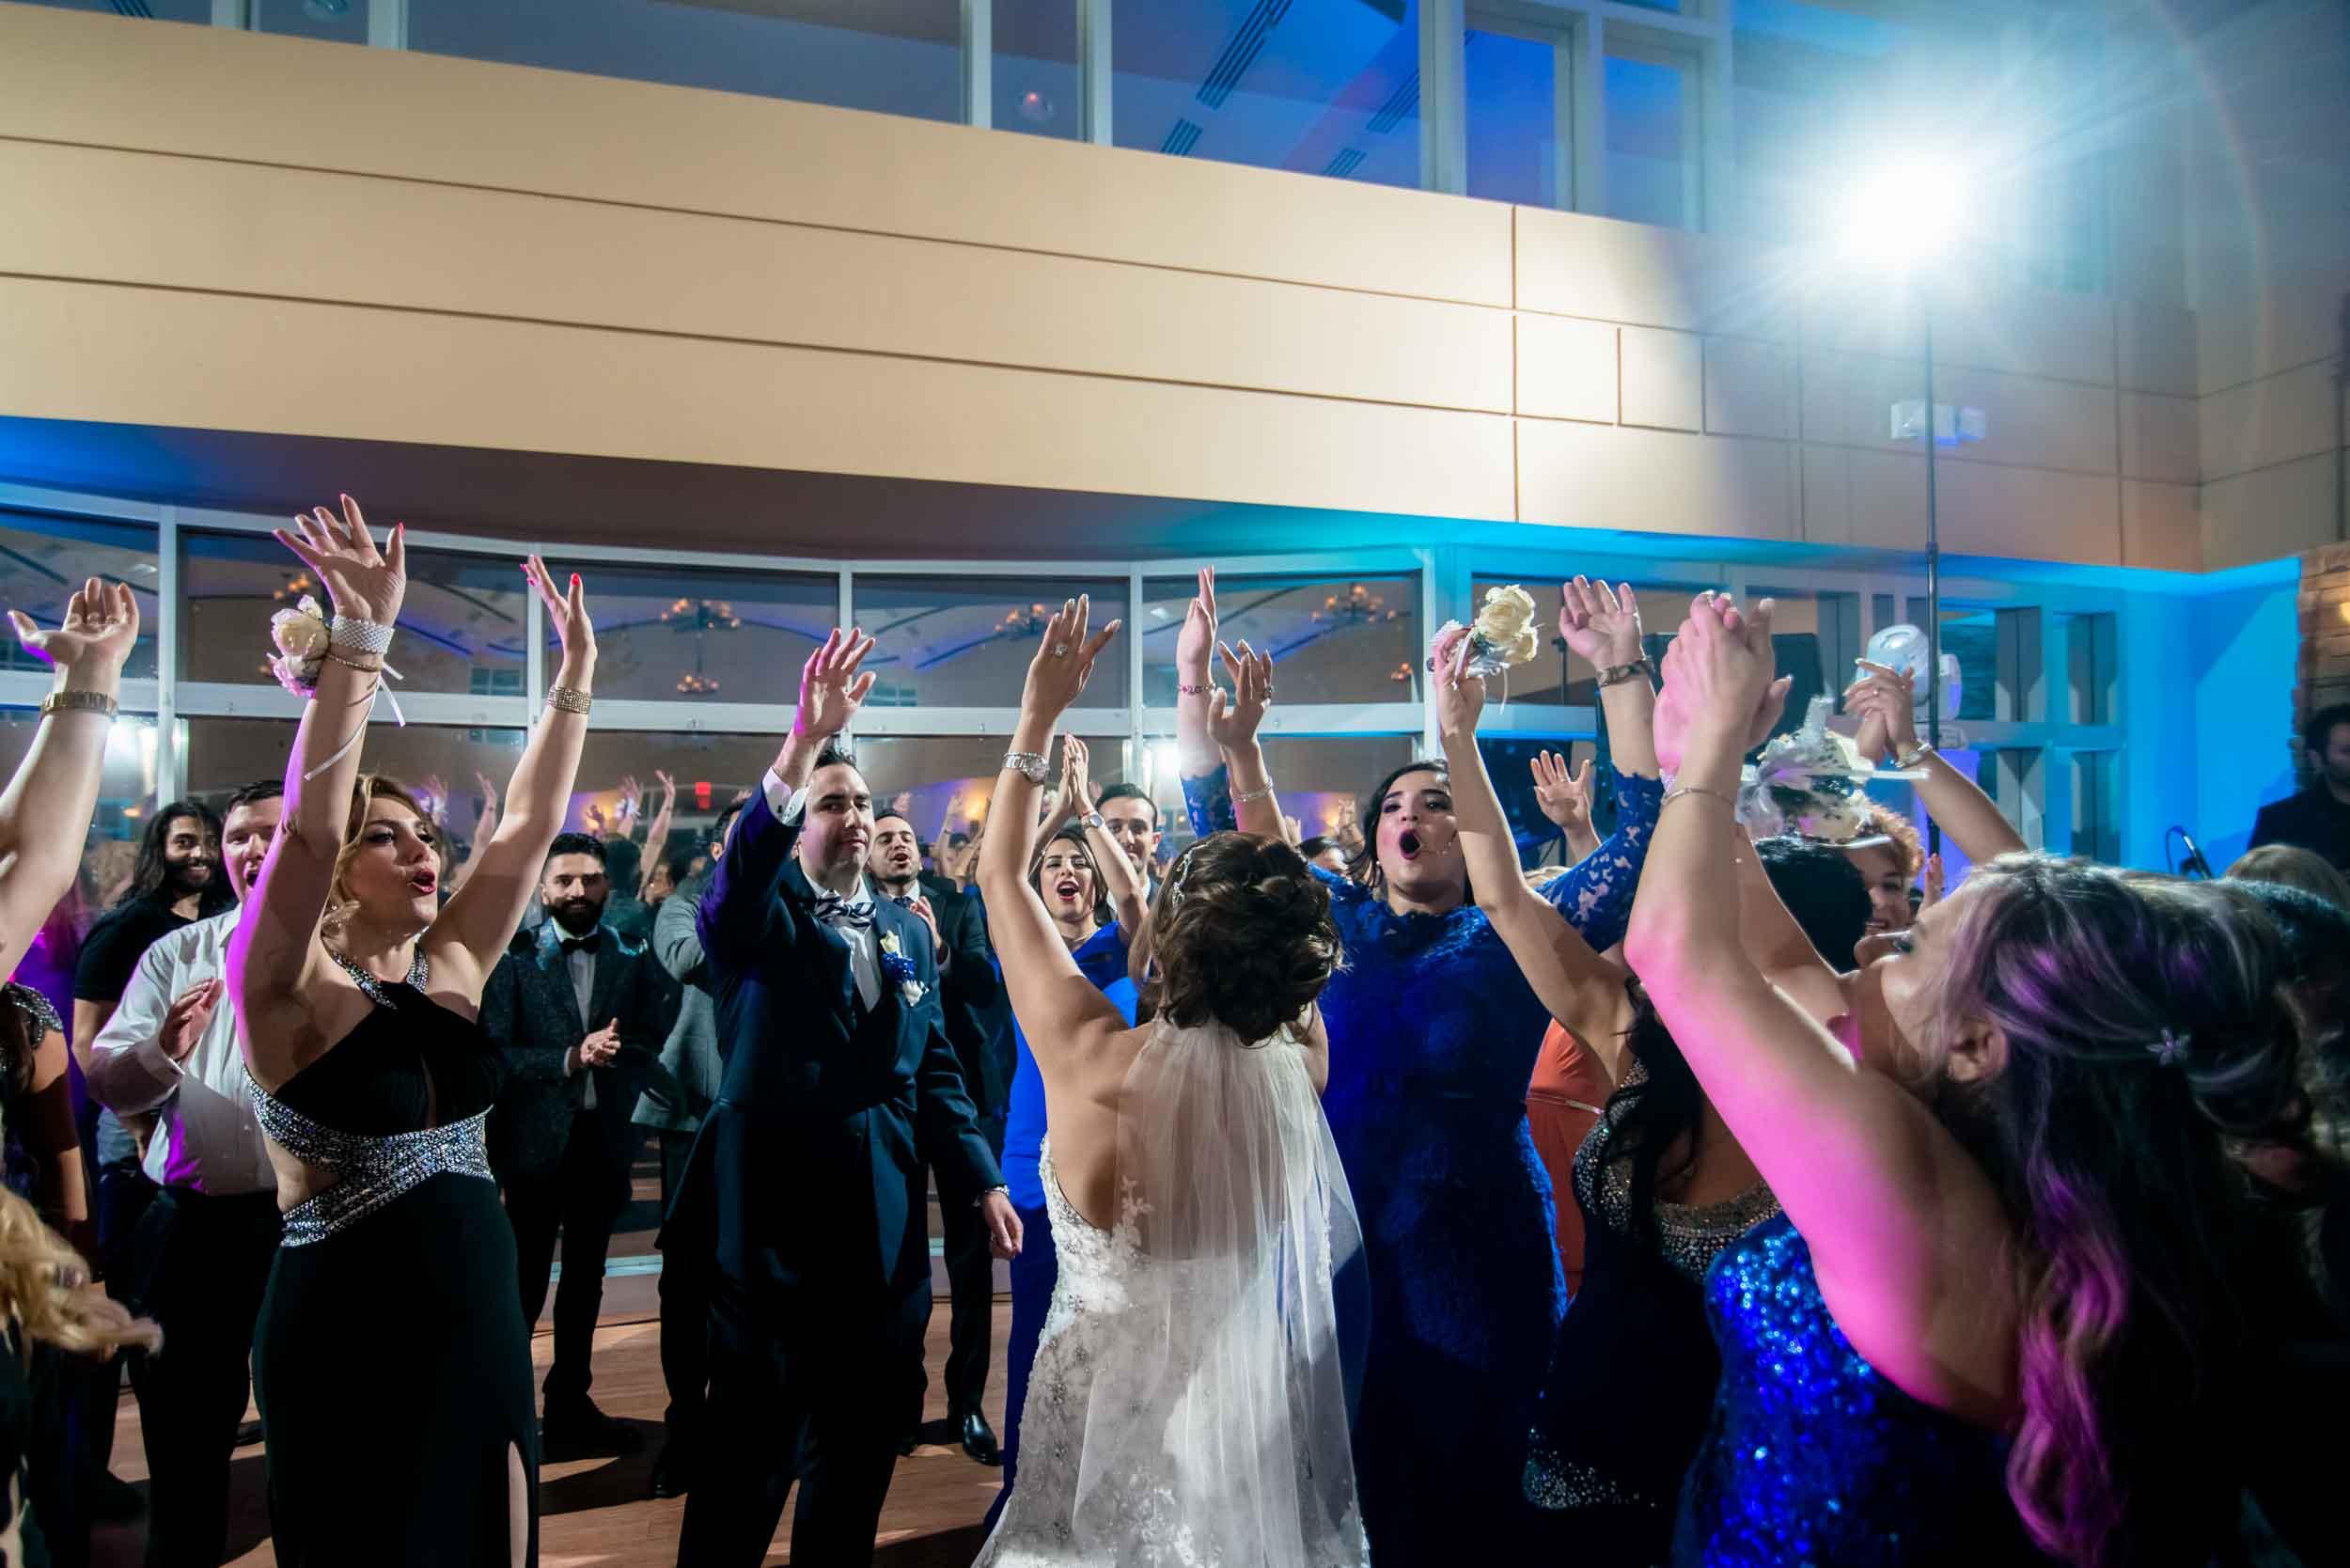 dc+metro+wedding+photographer+vadym+guliuk+photography+wedding+reception-2027.jpg